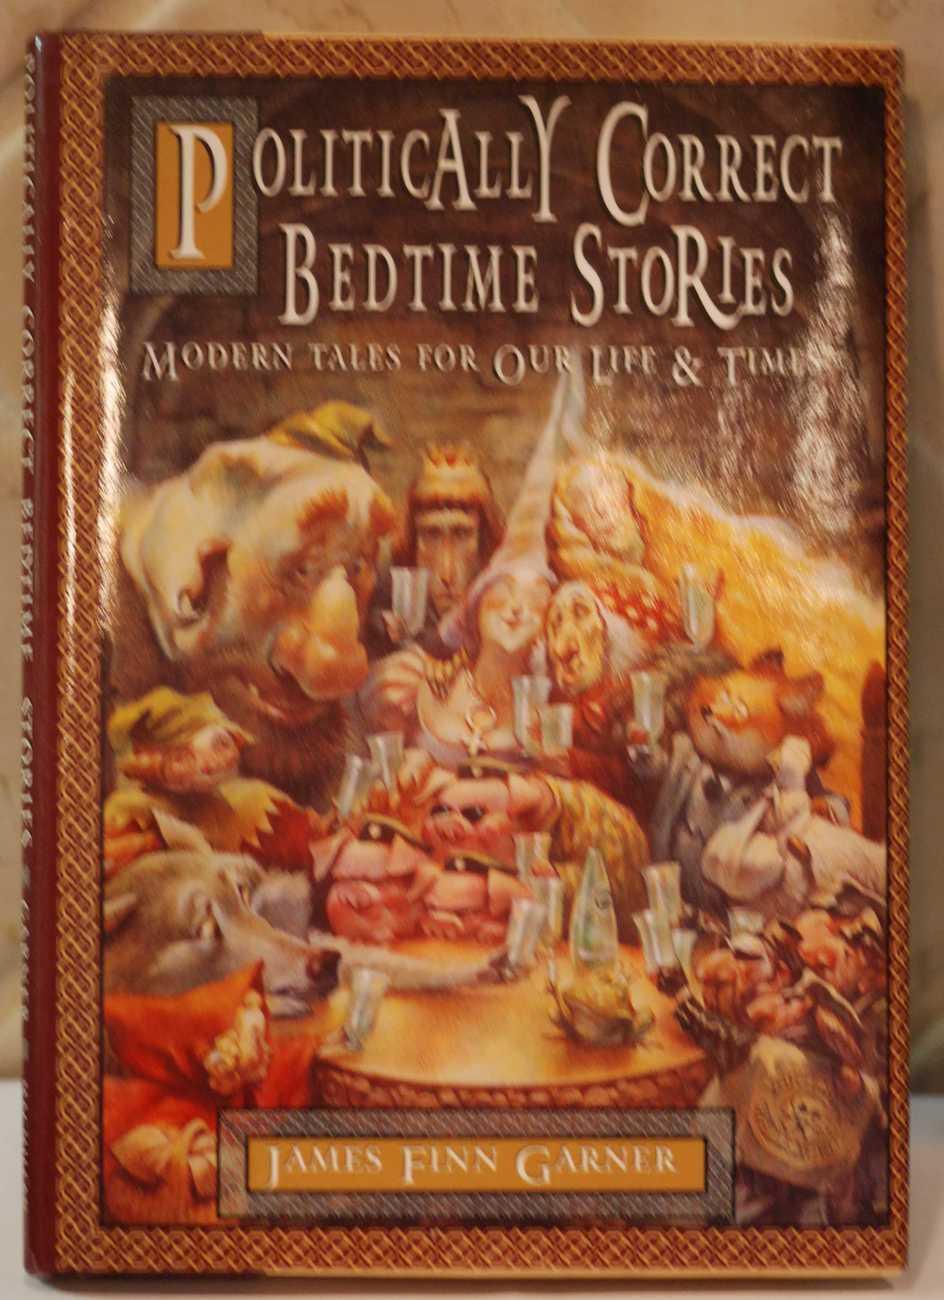 Dsc 1870 politically correct bedtime stories